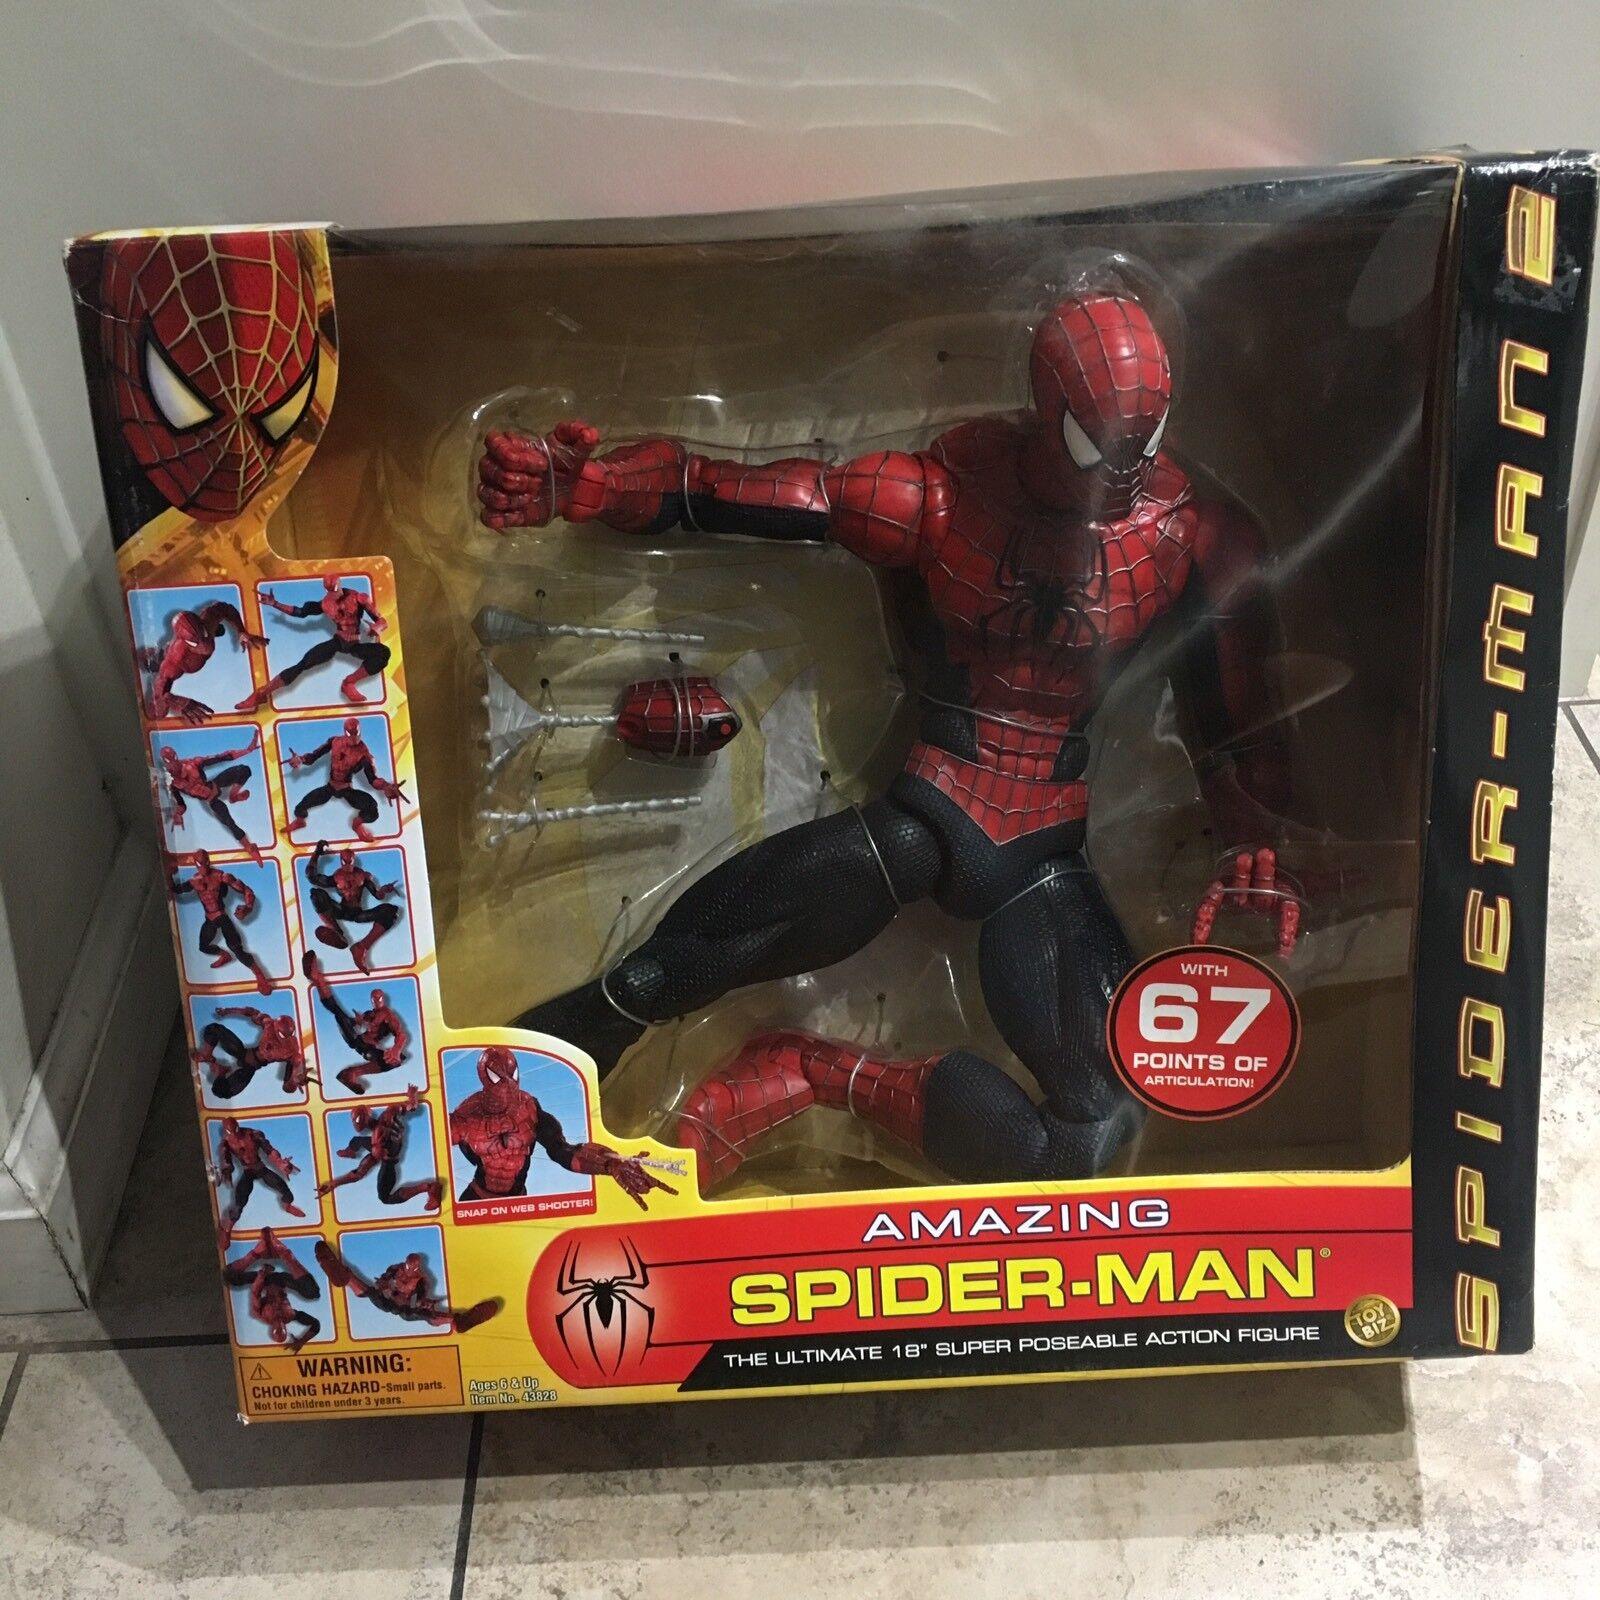 "18 "" Spider-Man Figure 67 Points Of Articulation"